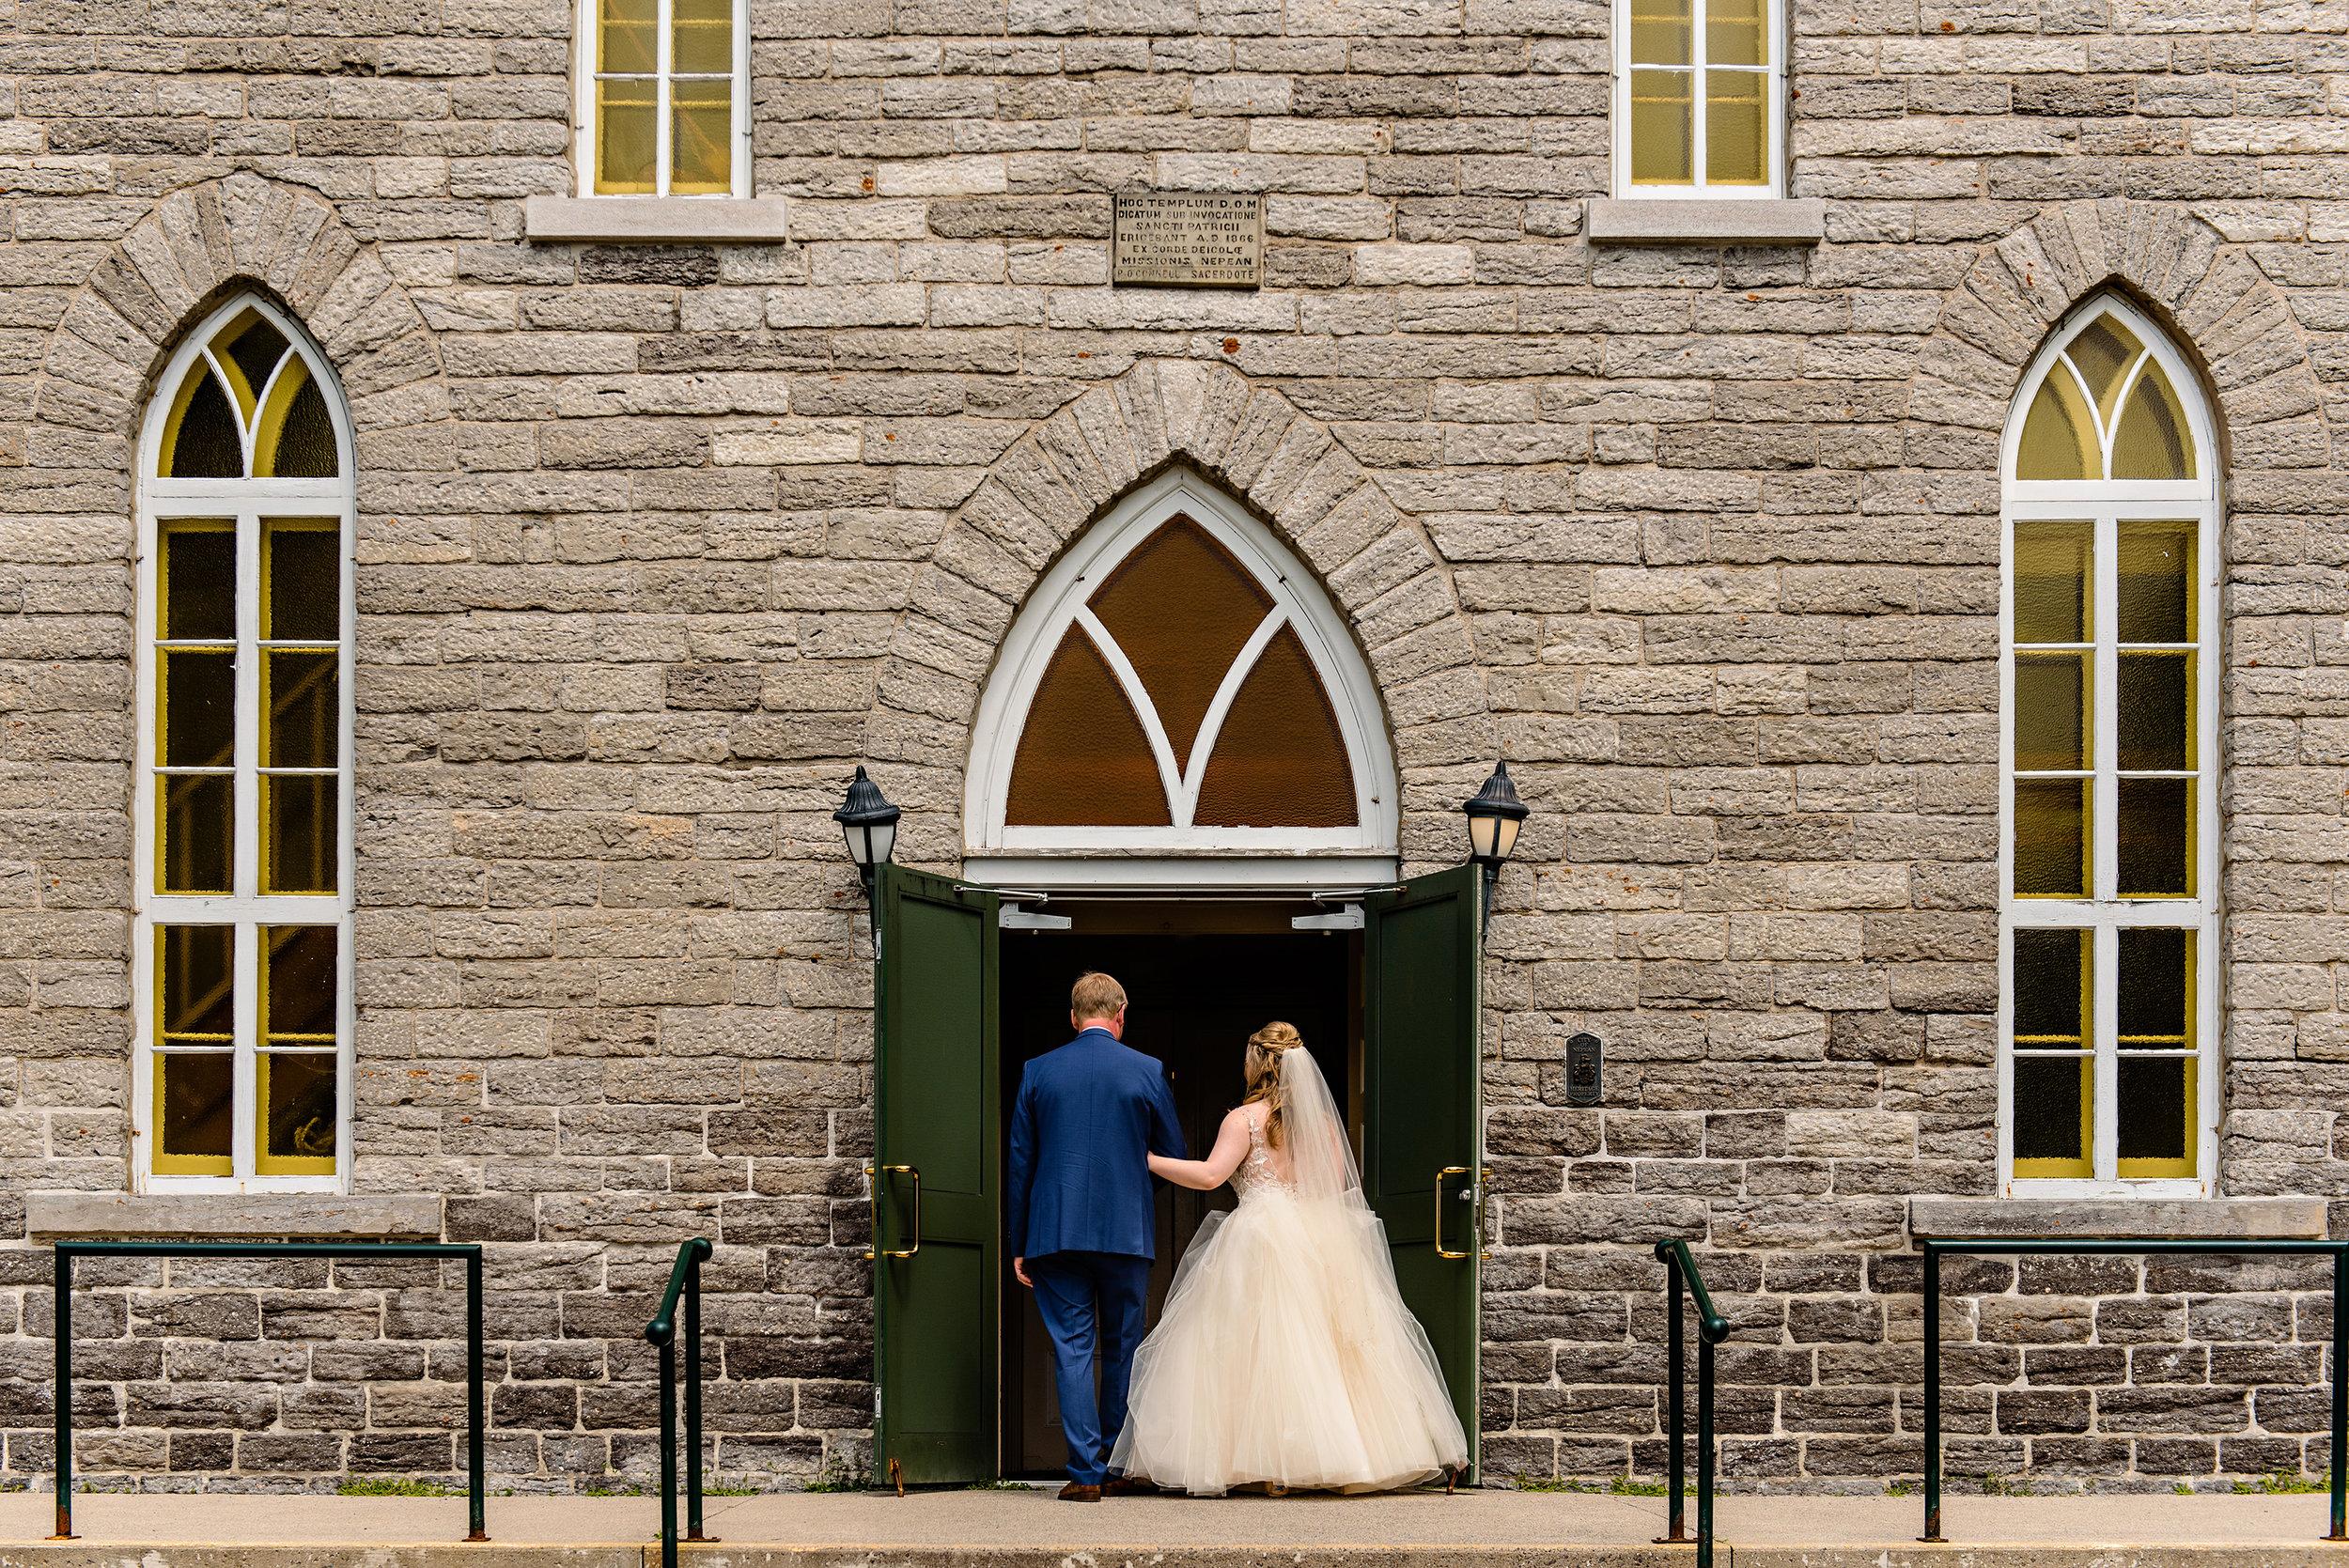 bride-and-father-enter-patricks-church-at-a-wedding-in-richmond-ontario.jpg